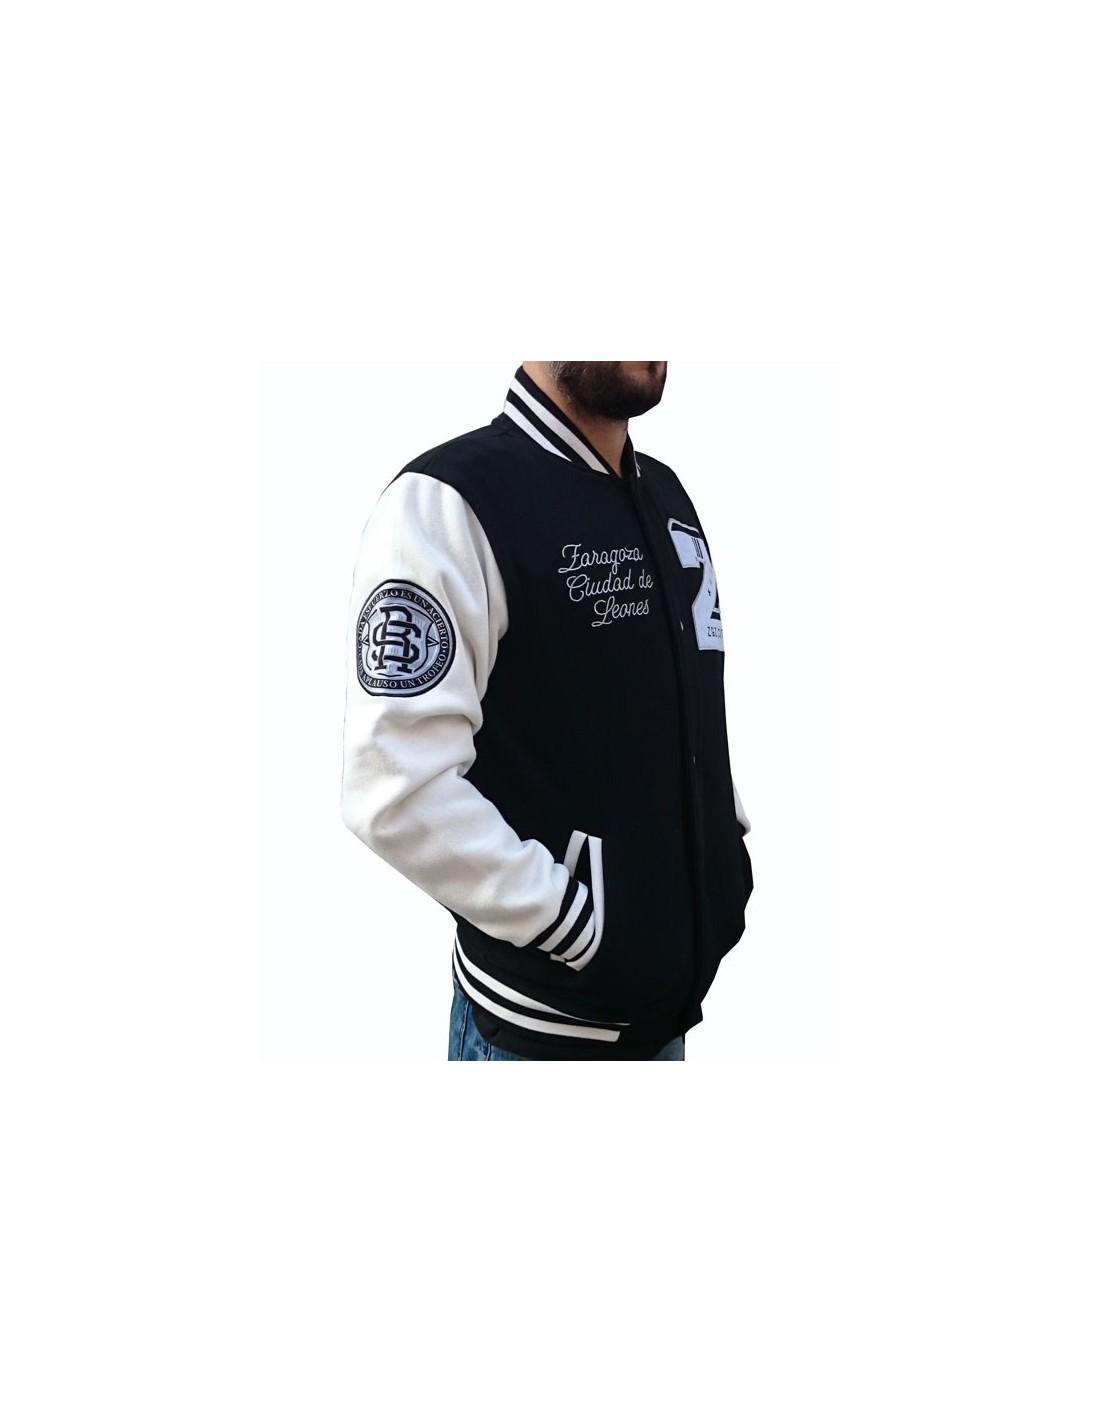 474bcddcdeb3a sudaderas rap